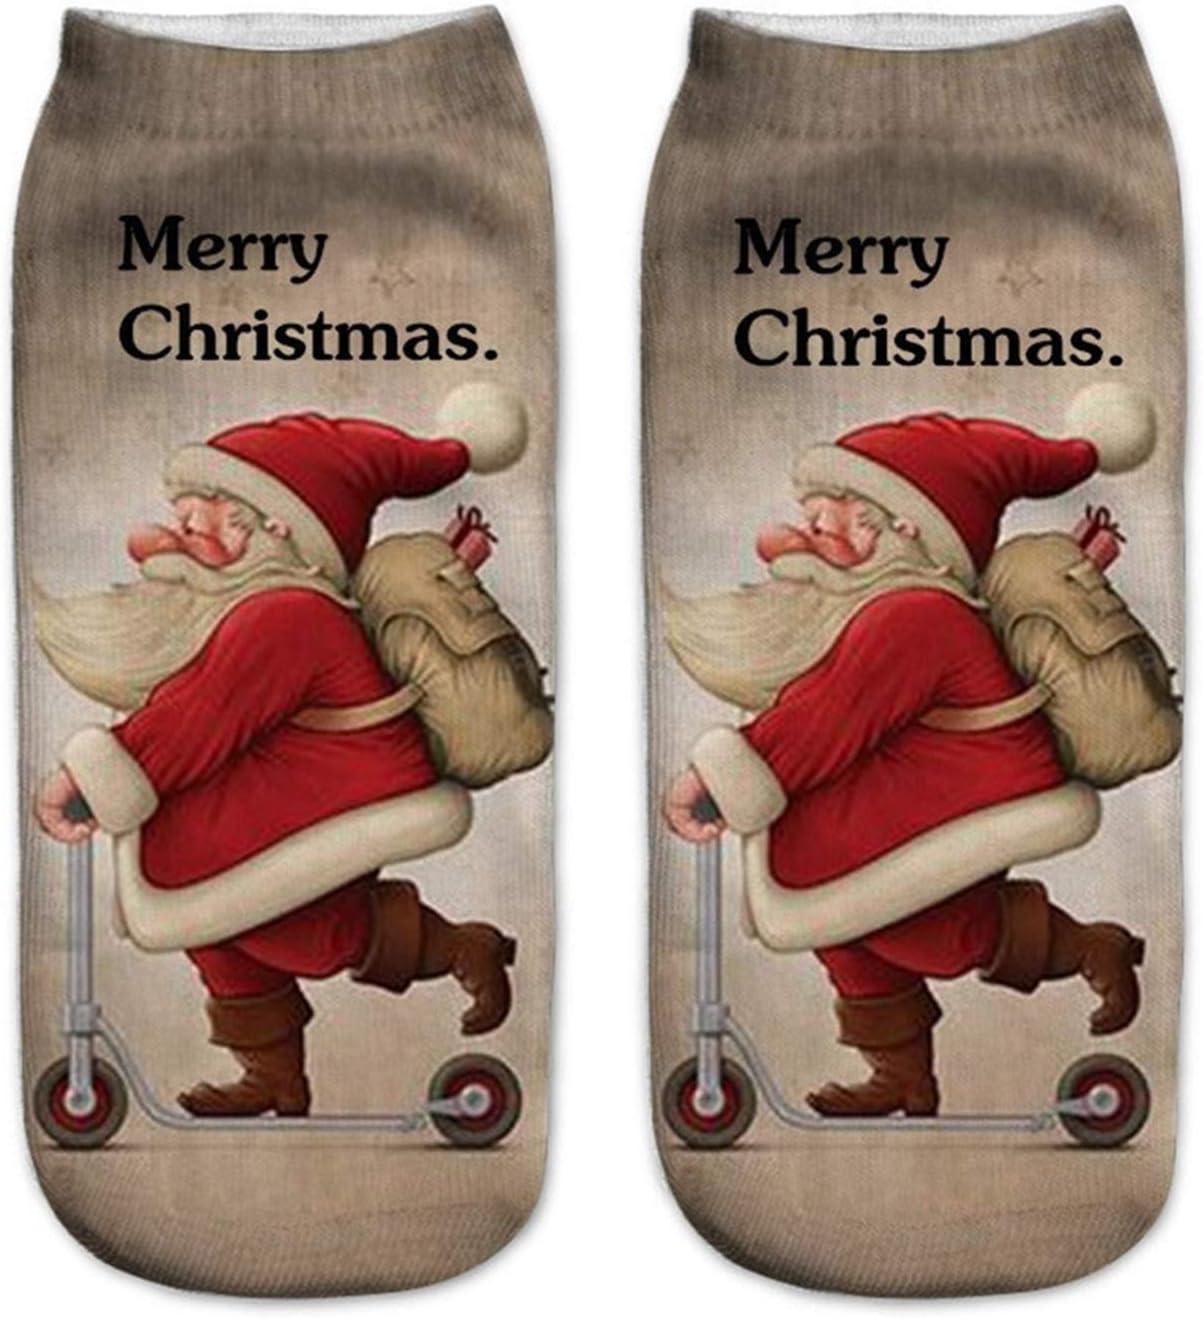 Jgzwlkj Christmas Socks Casual Christmas Socks Work Business Soc